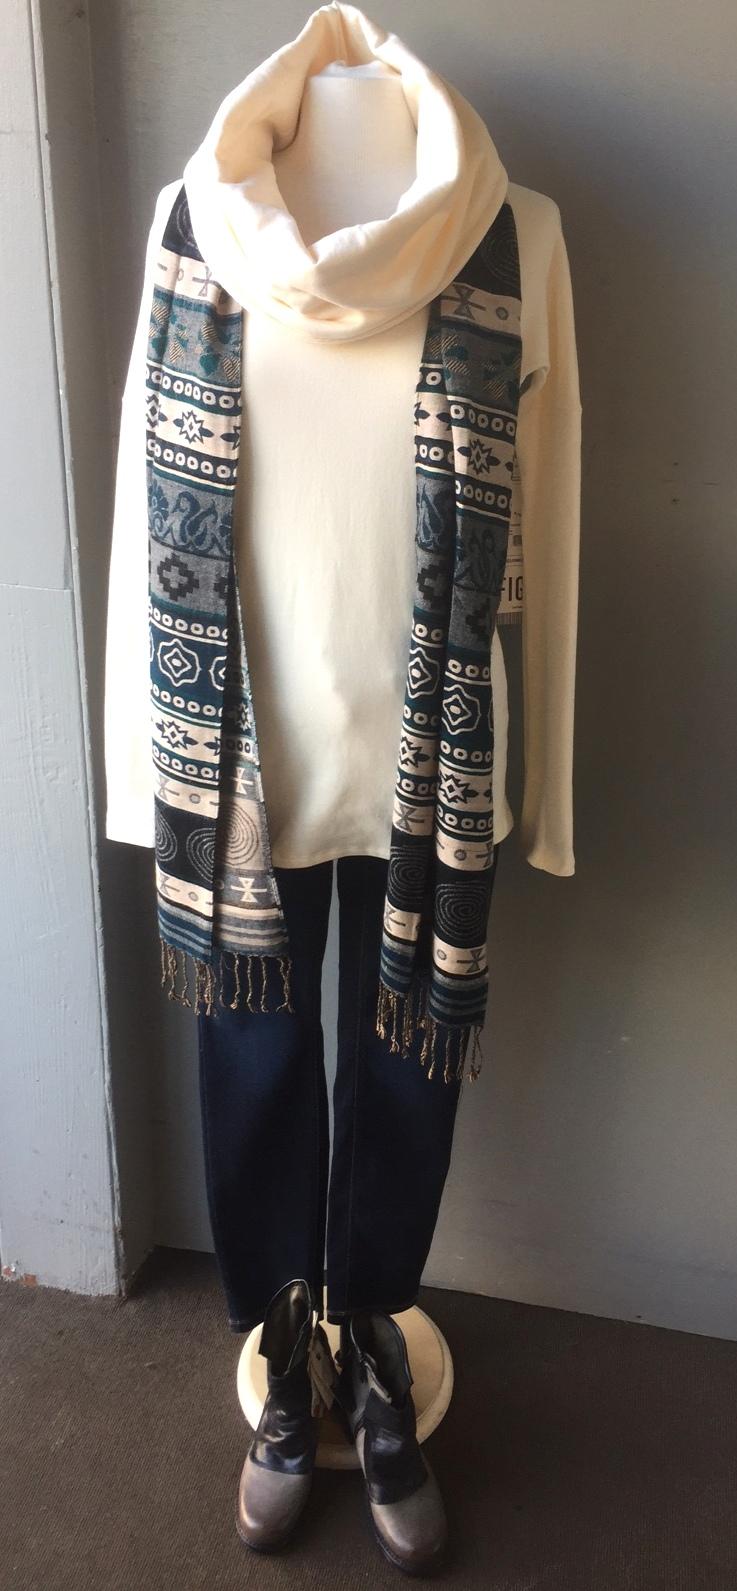 Fig sweater, aventura scarf, Mac jeans and as98 bootsA.jpg